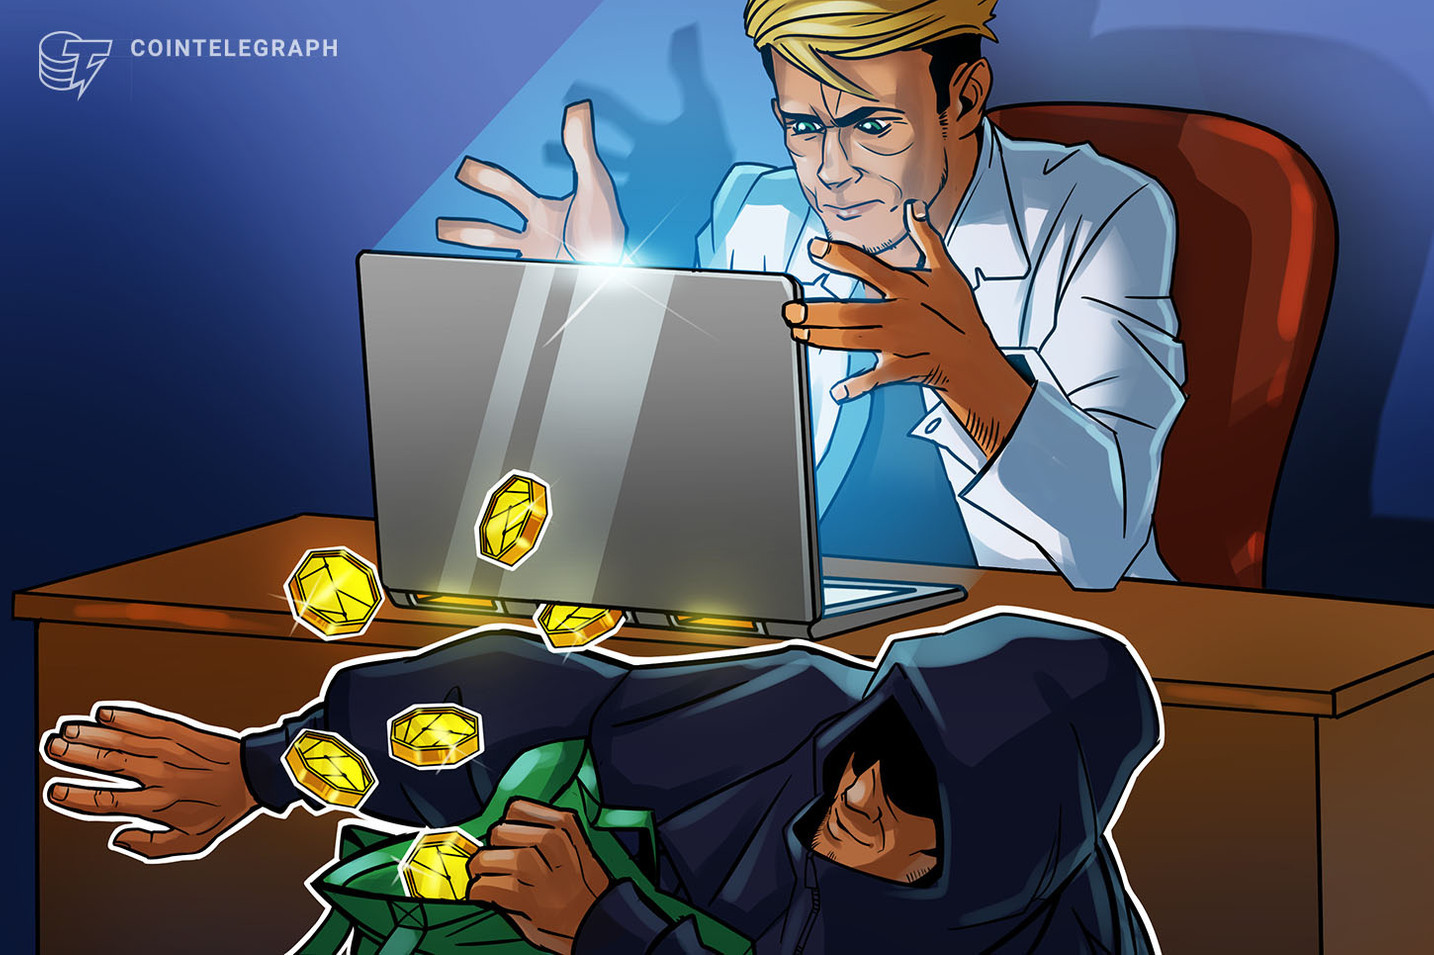 Nuevo malware bancario apunta a países de habla portuguesa e hispana para robar BTC